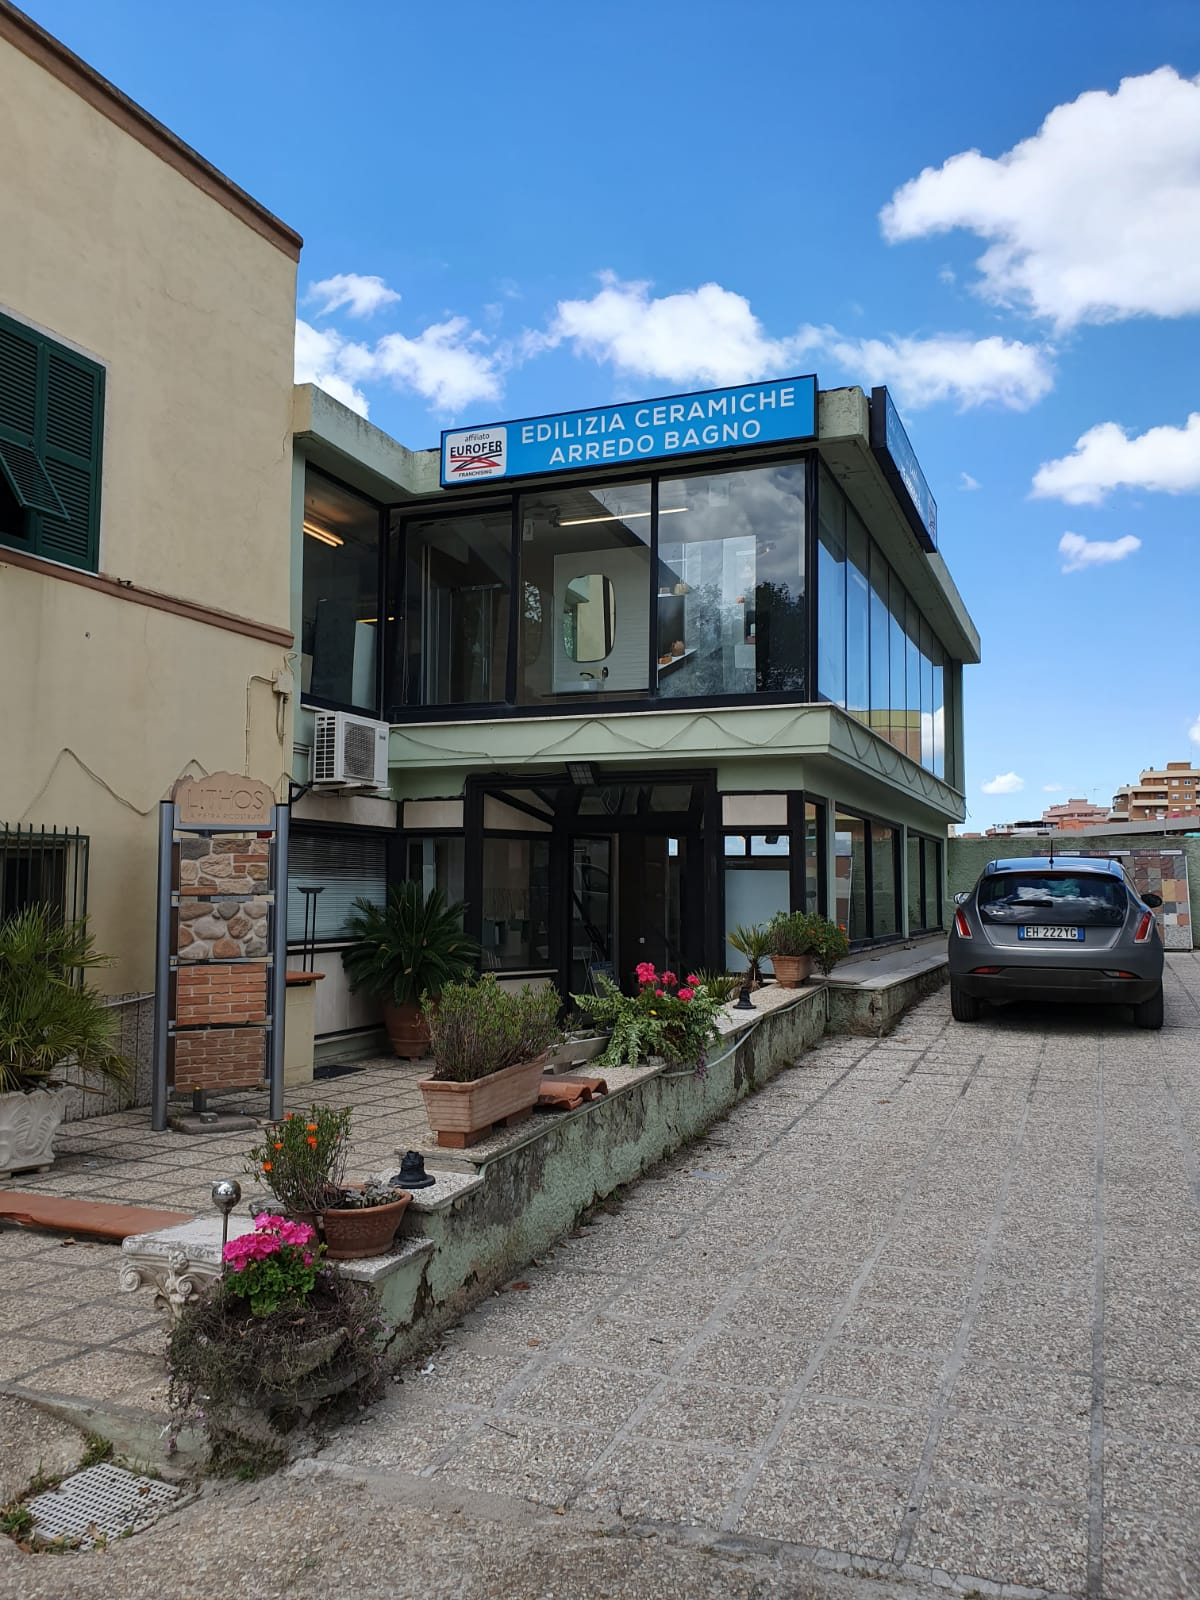 Eurofer showroom Civitavecchia esterno